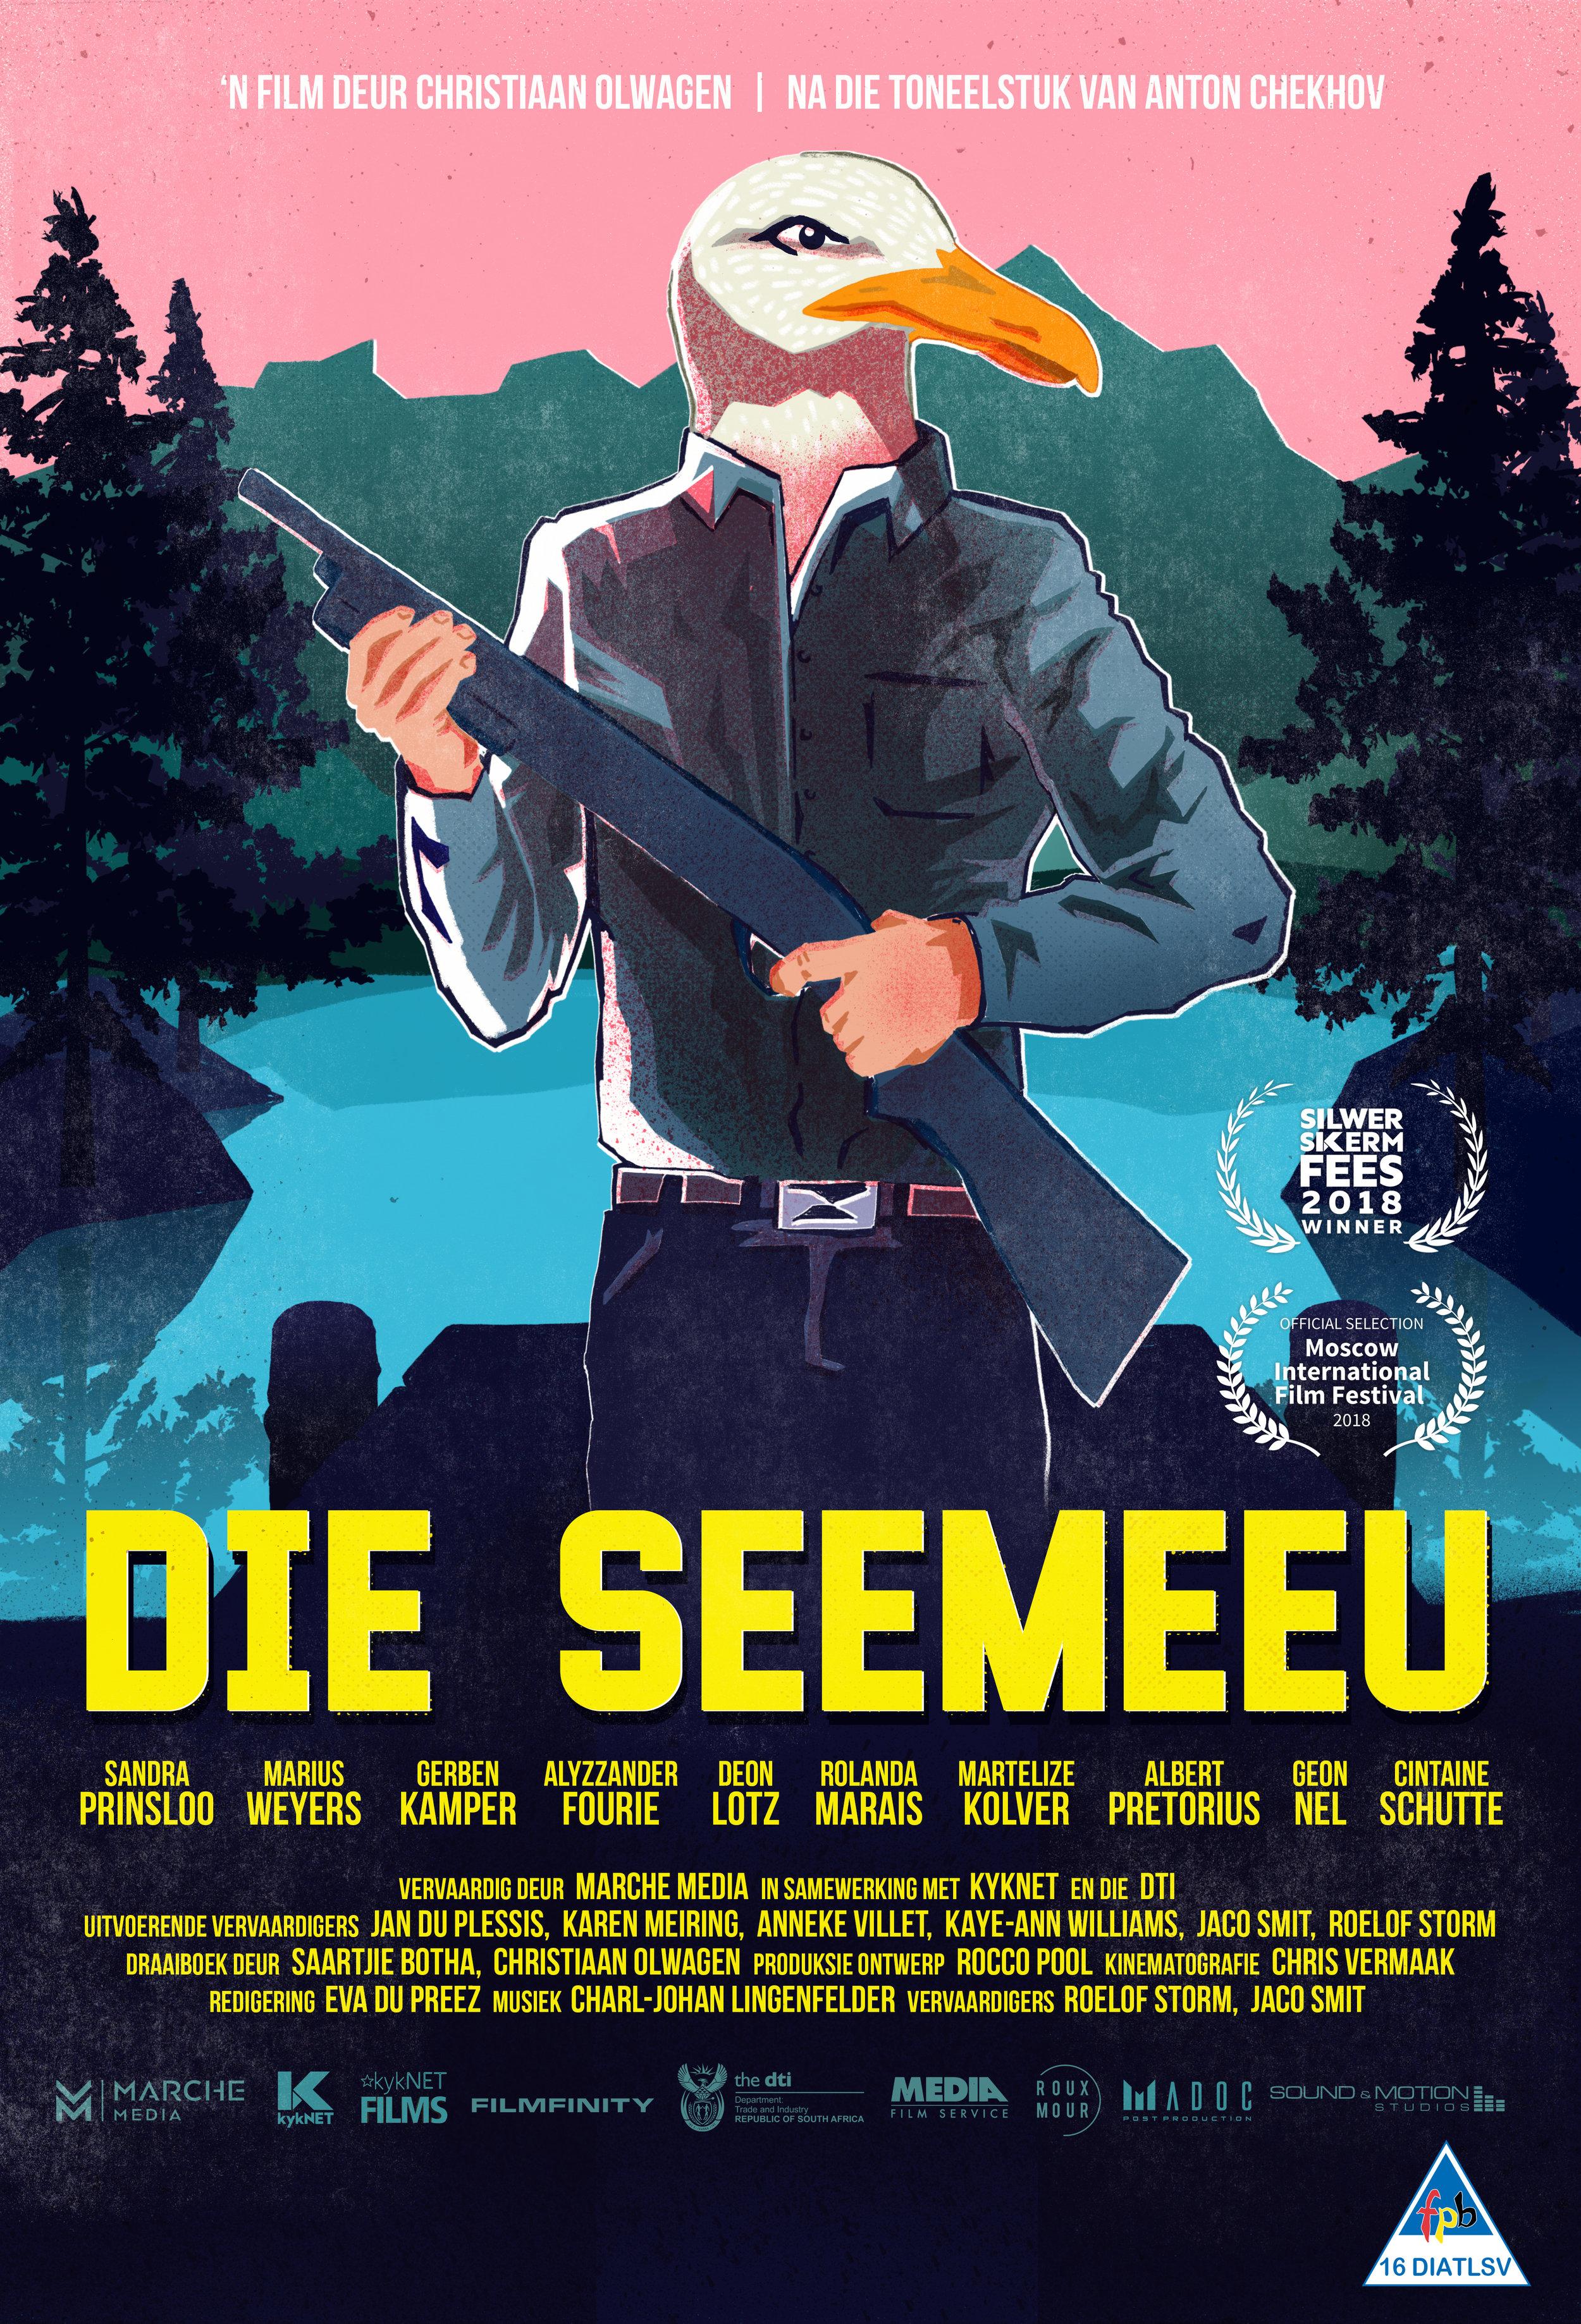 SEEMEEU-2018-poster-v3-no-frame.jpg